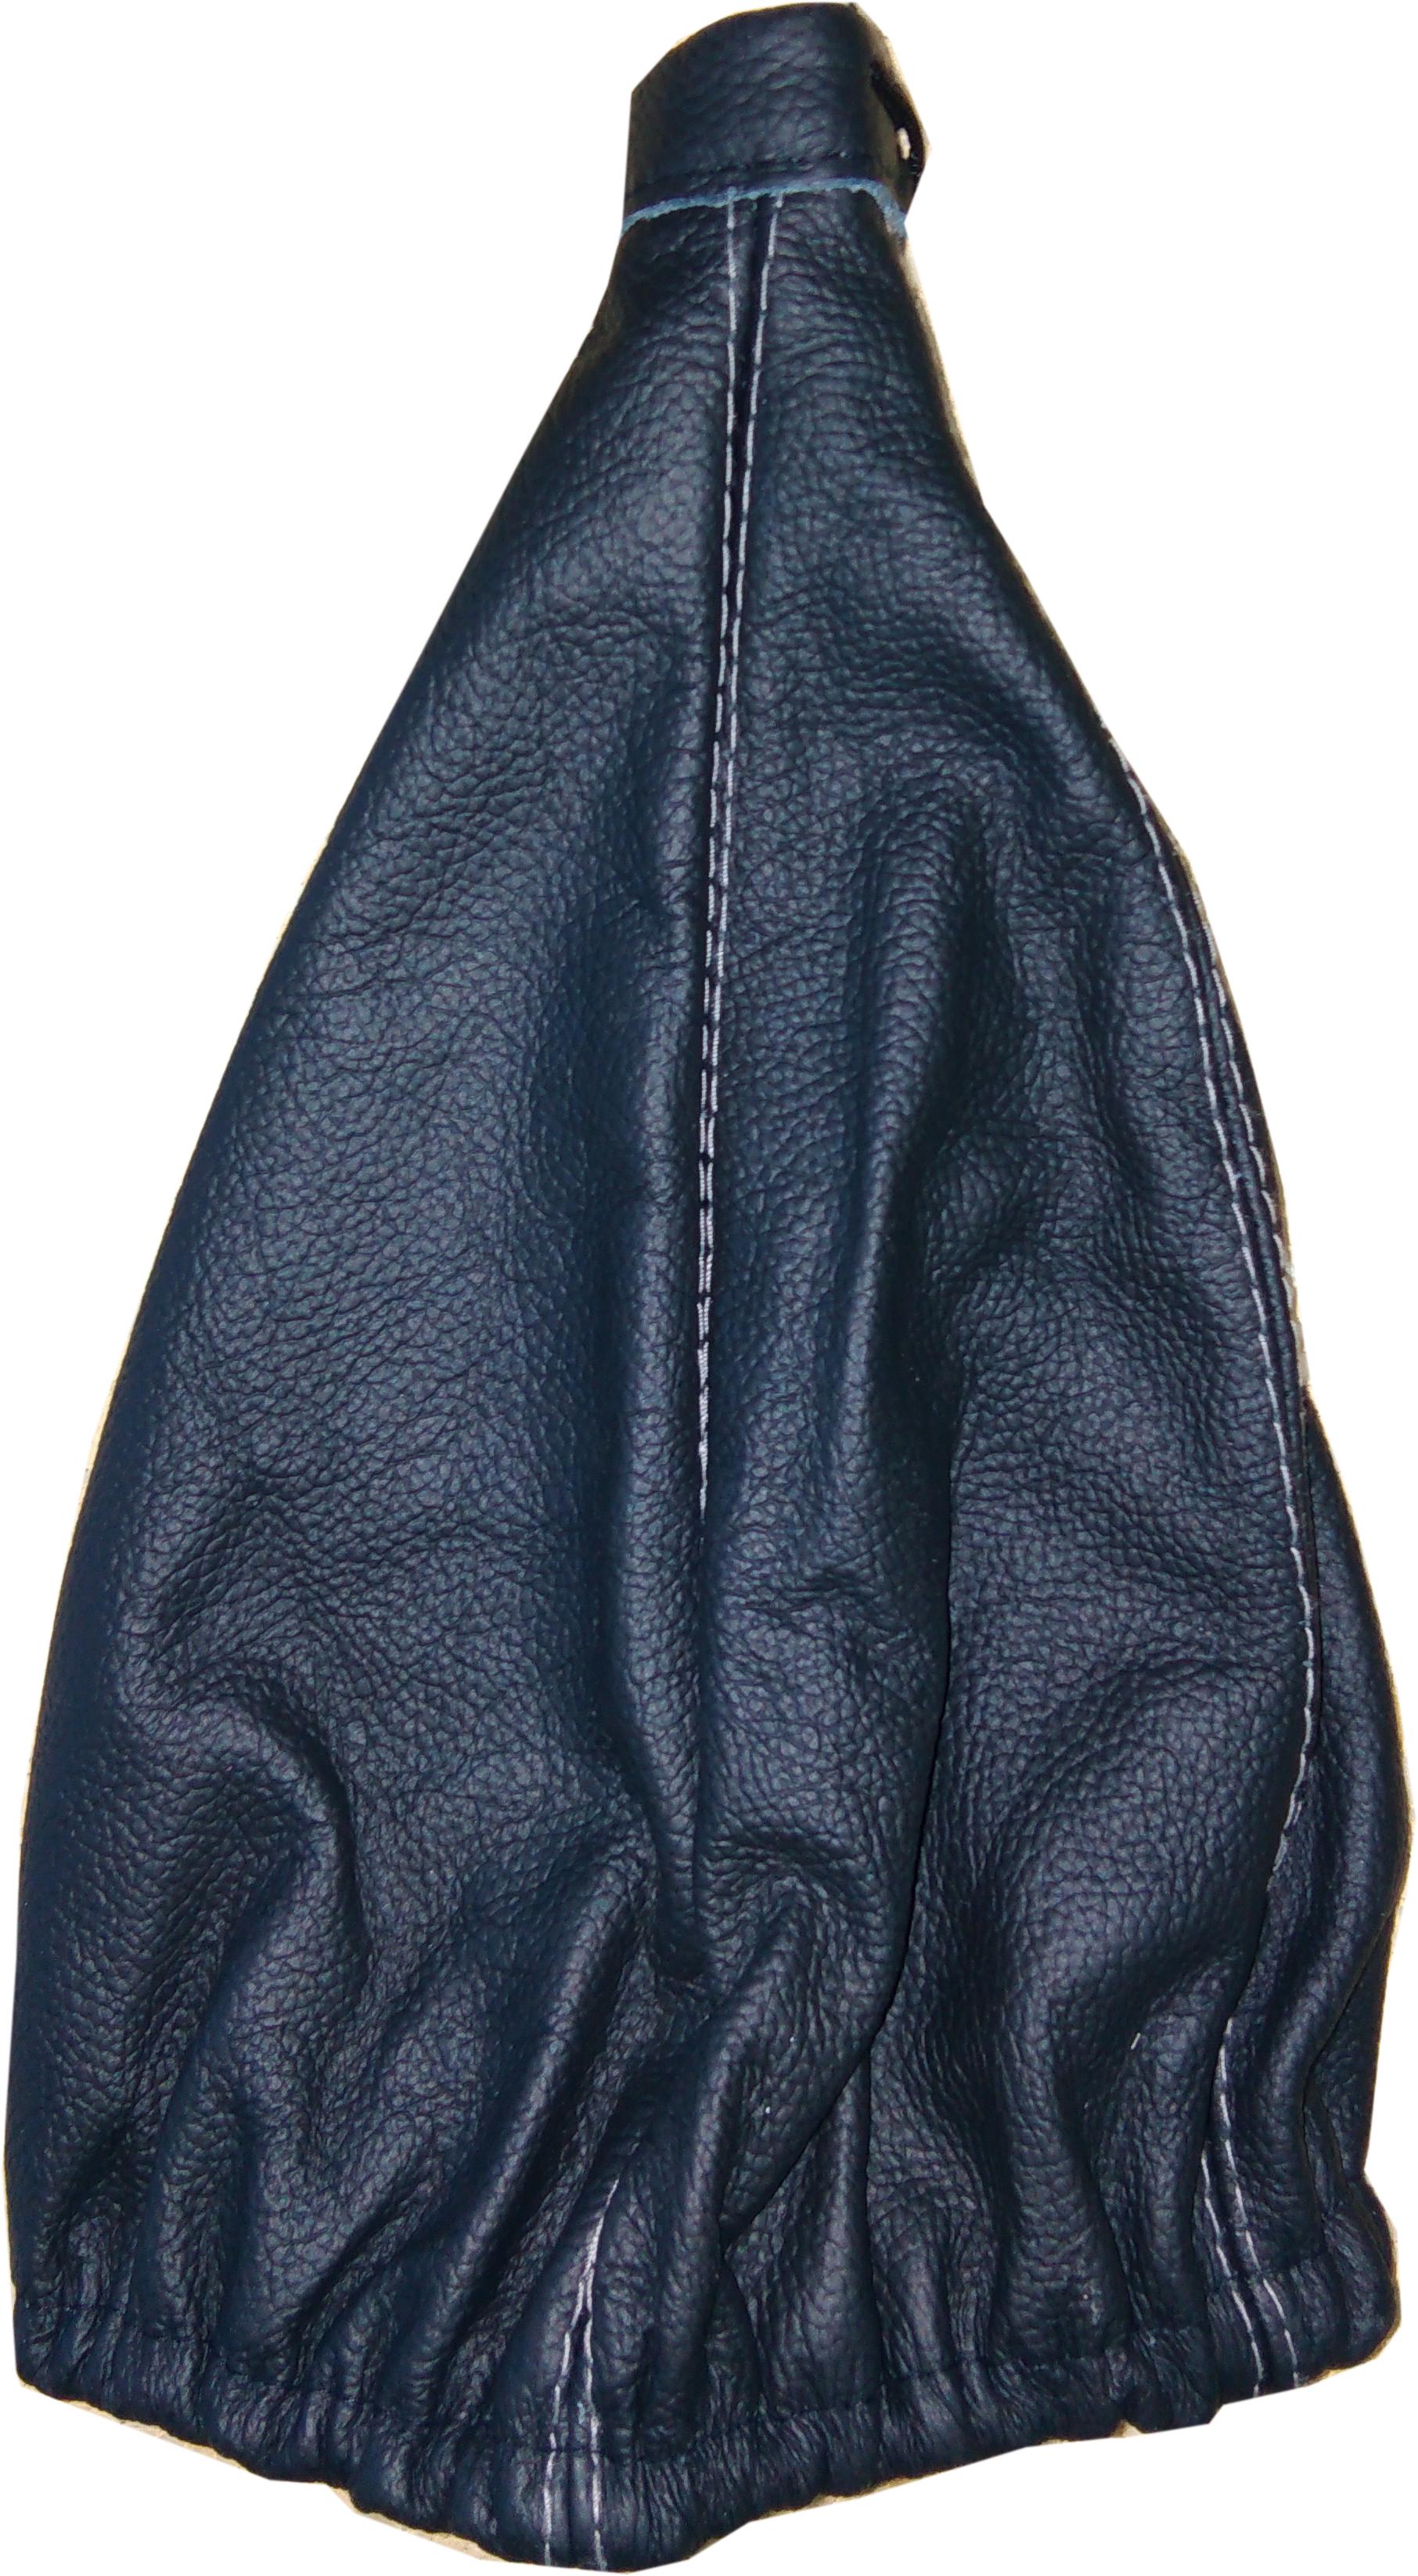 bottari-13316-funda-palanca-en-piel-bond-gris